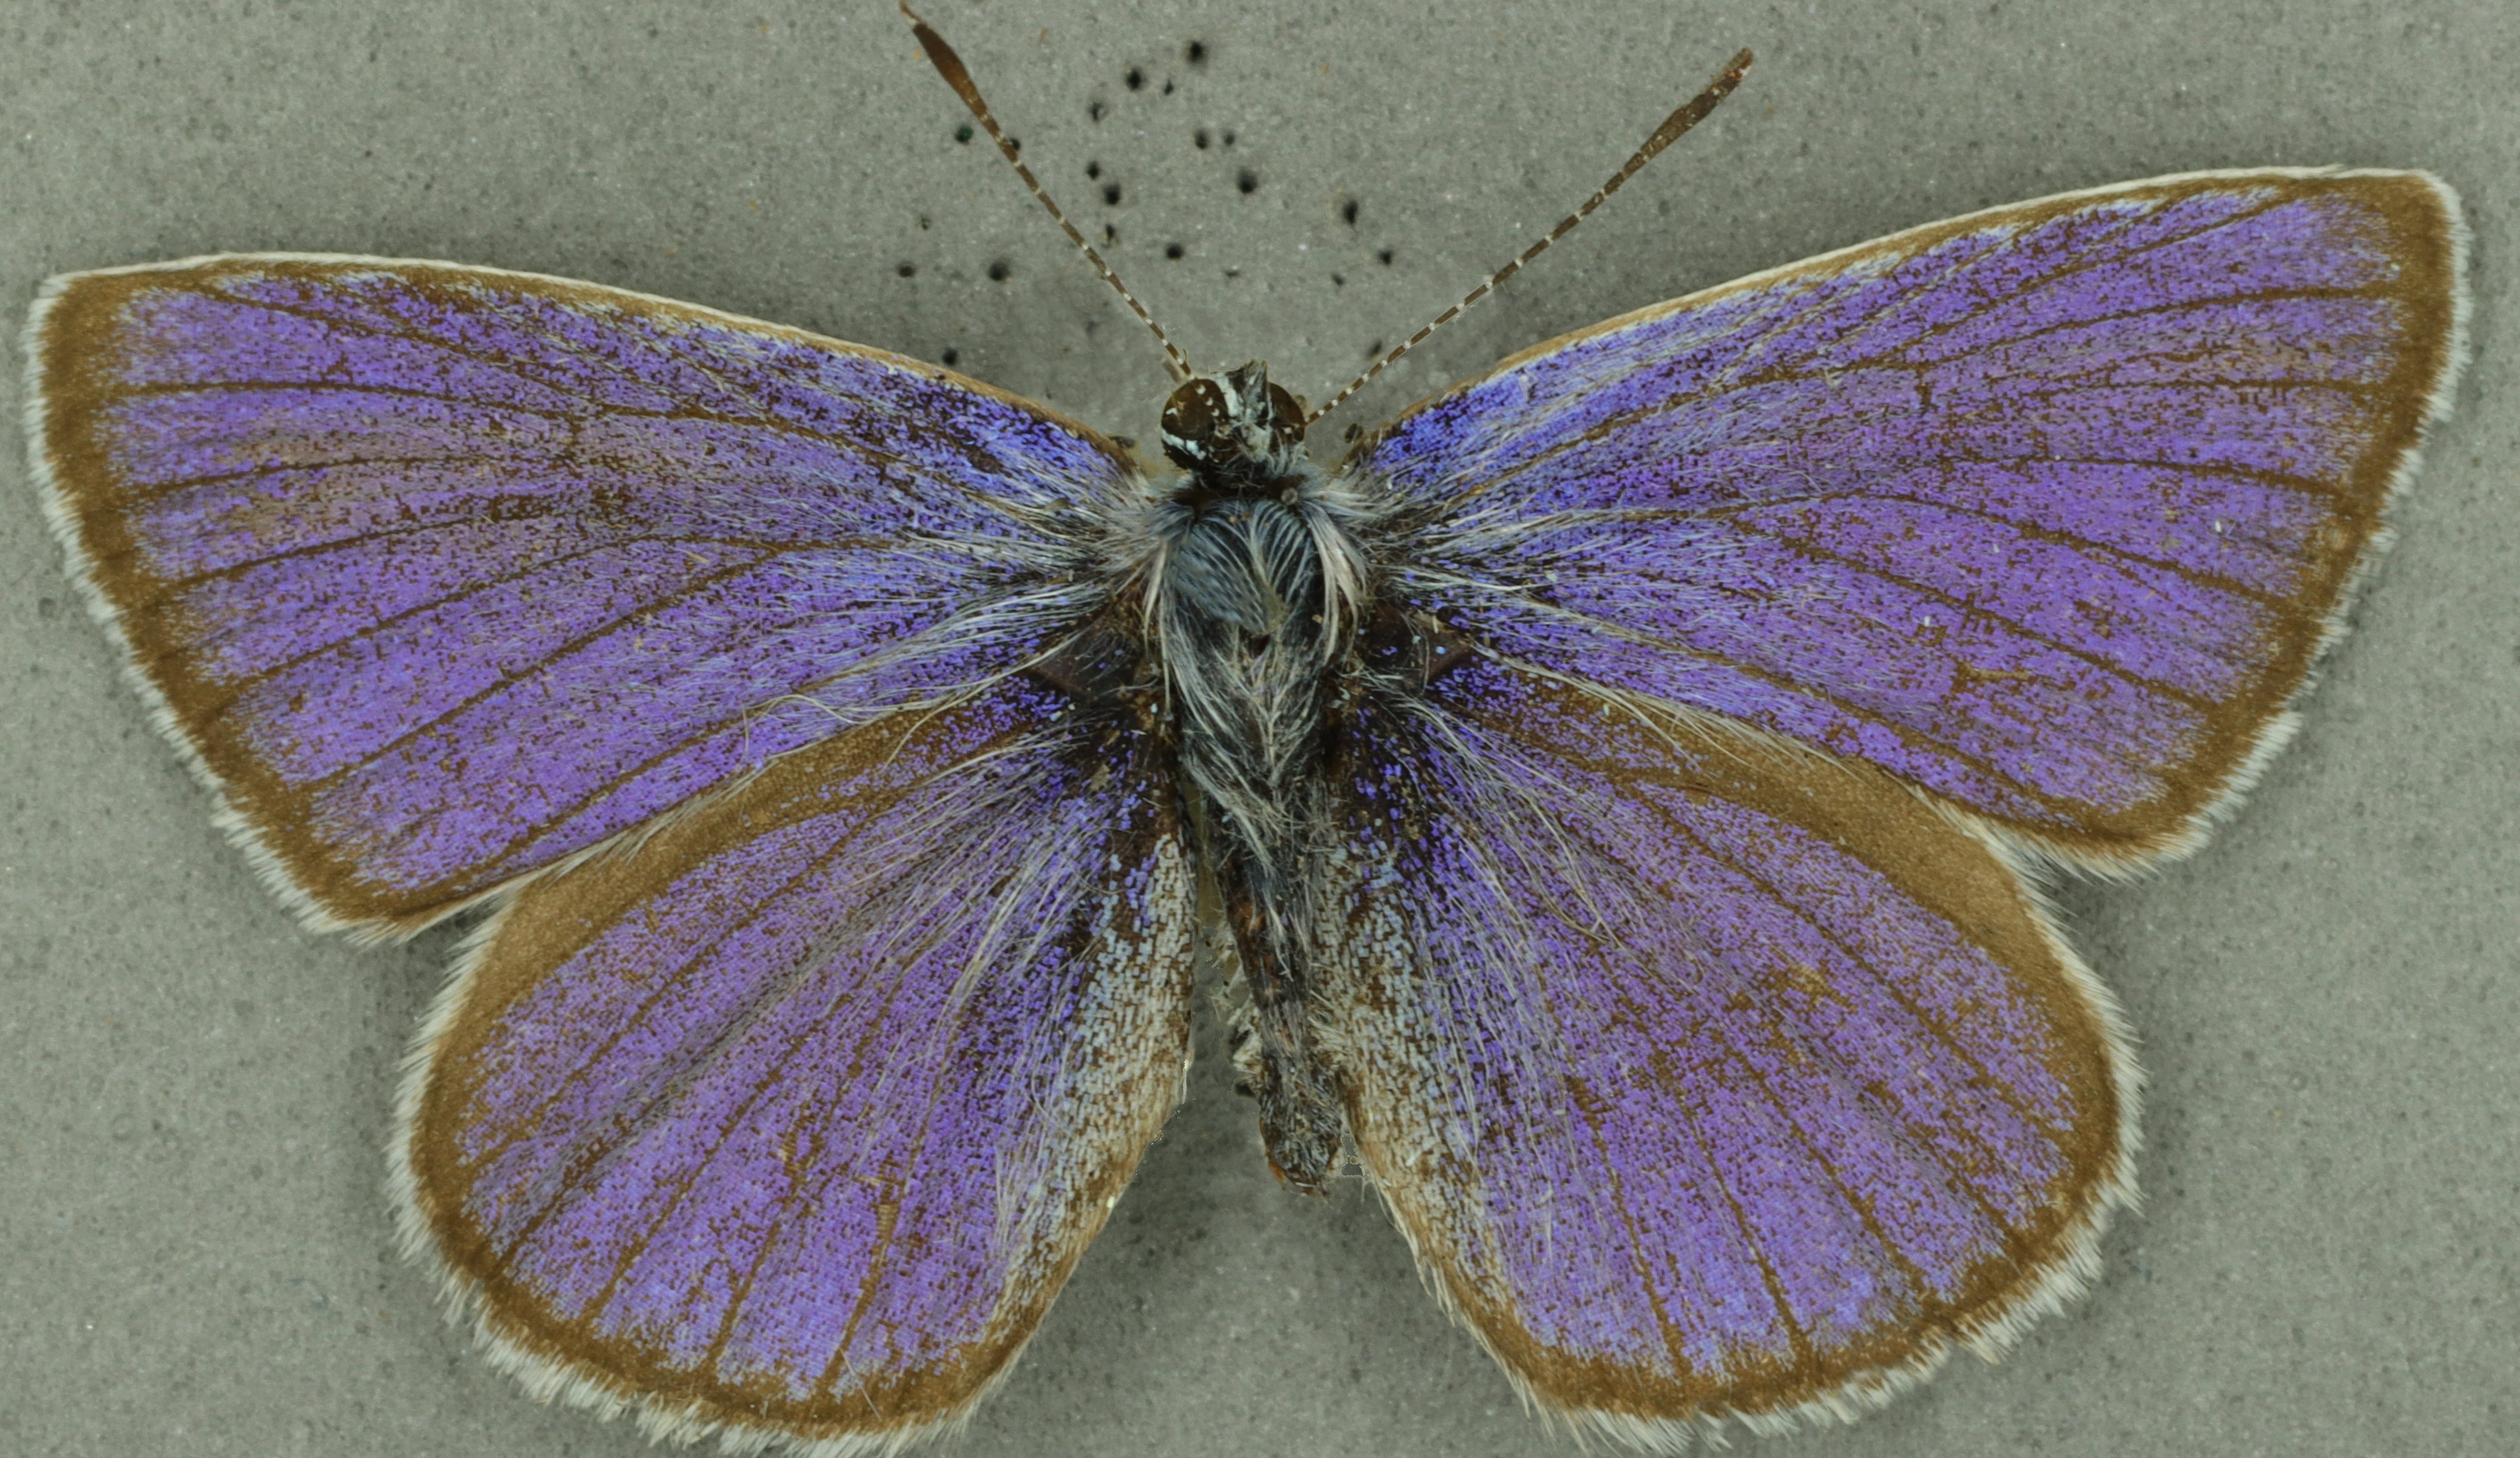 Mazarine blue male, University Museum of Zoology collection, copyright University of Cambridge